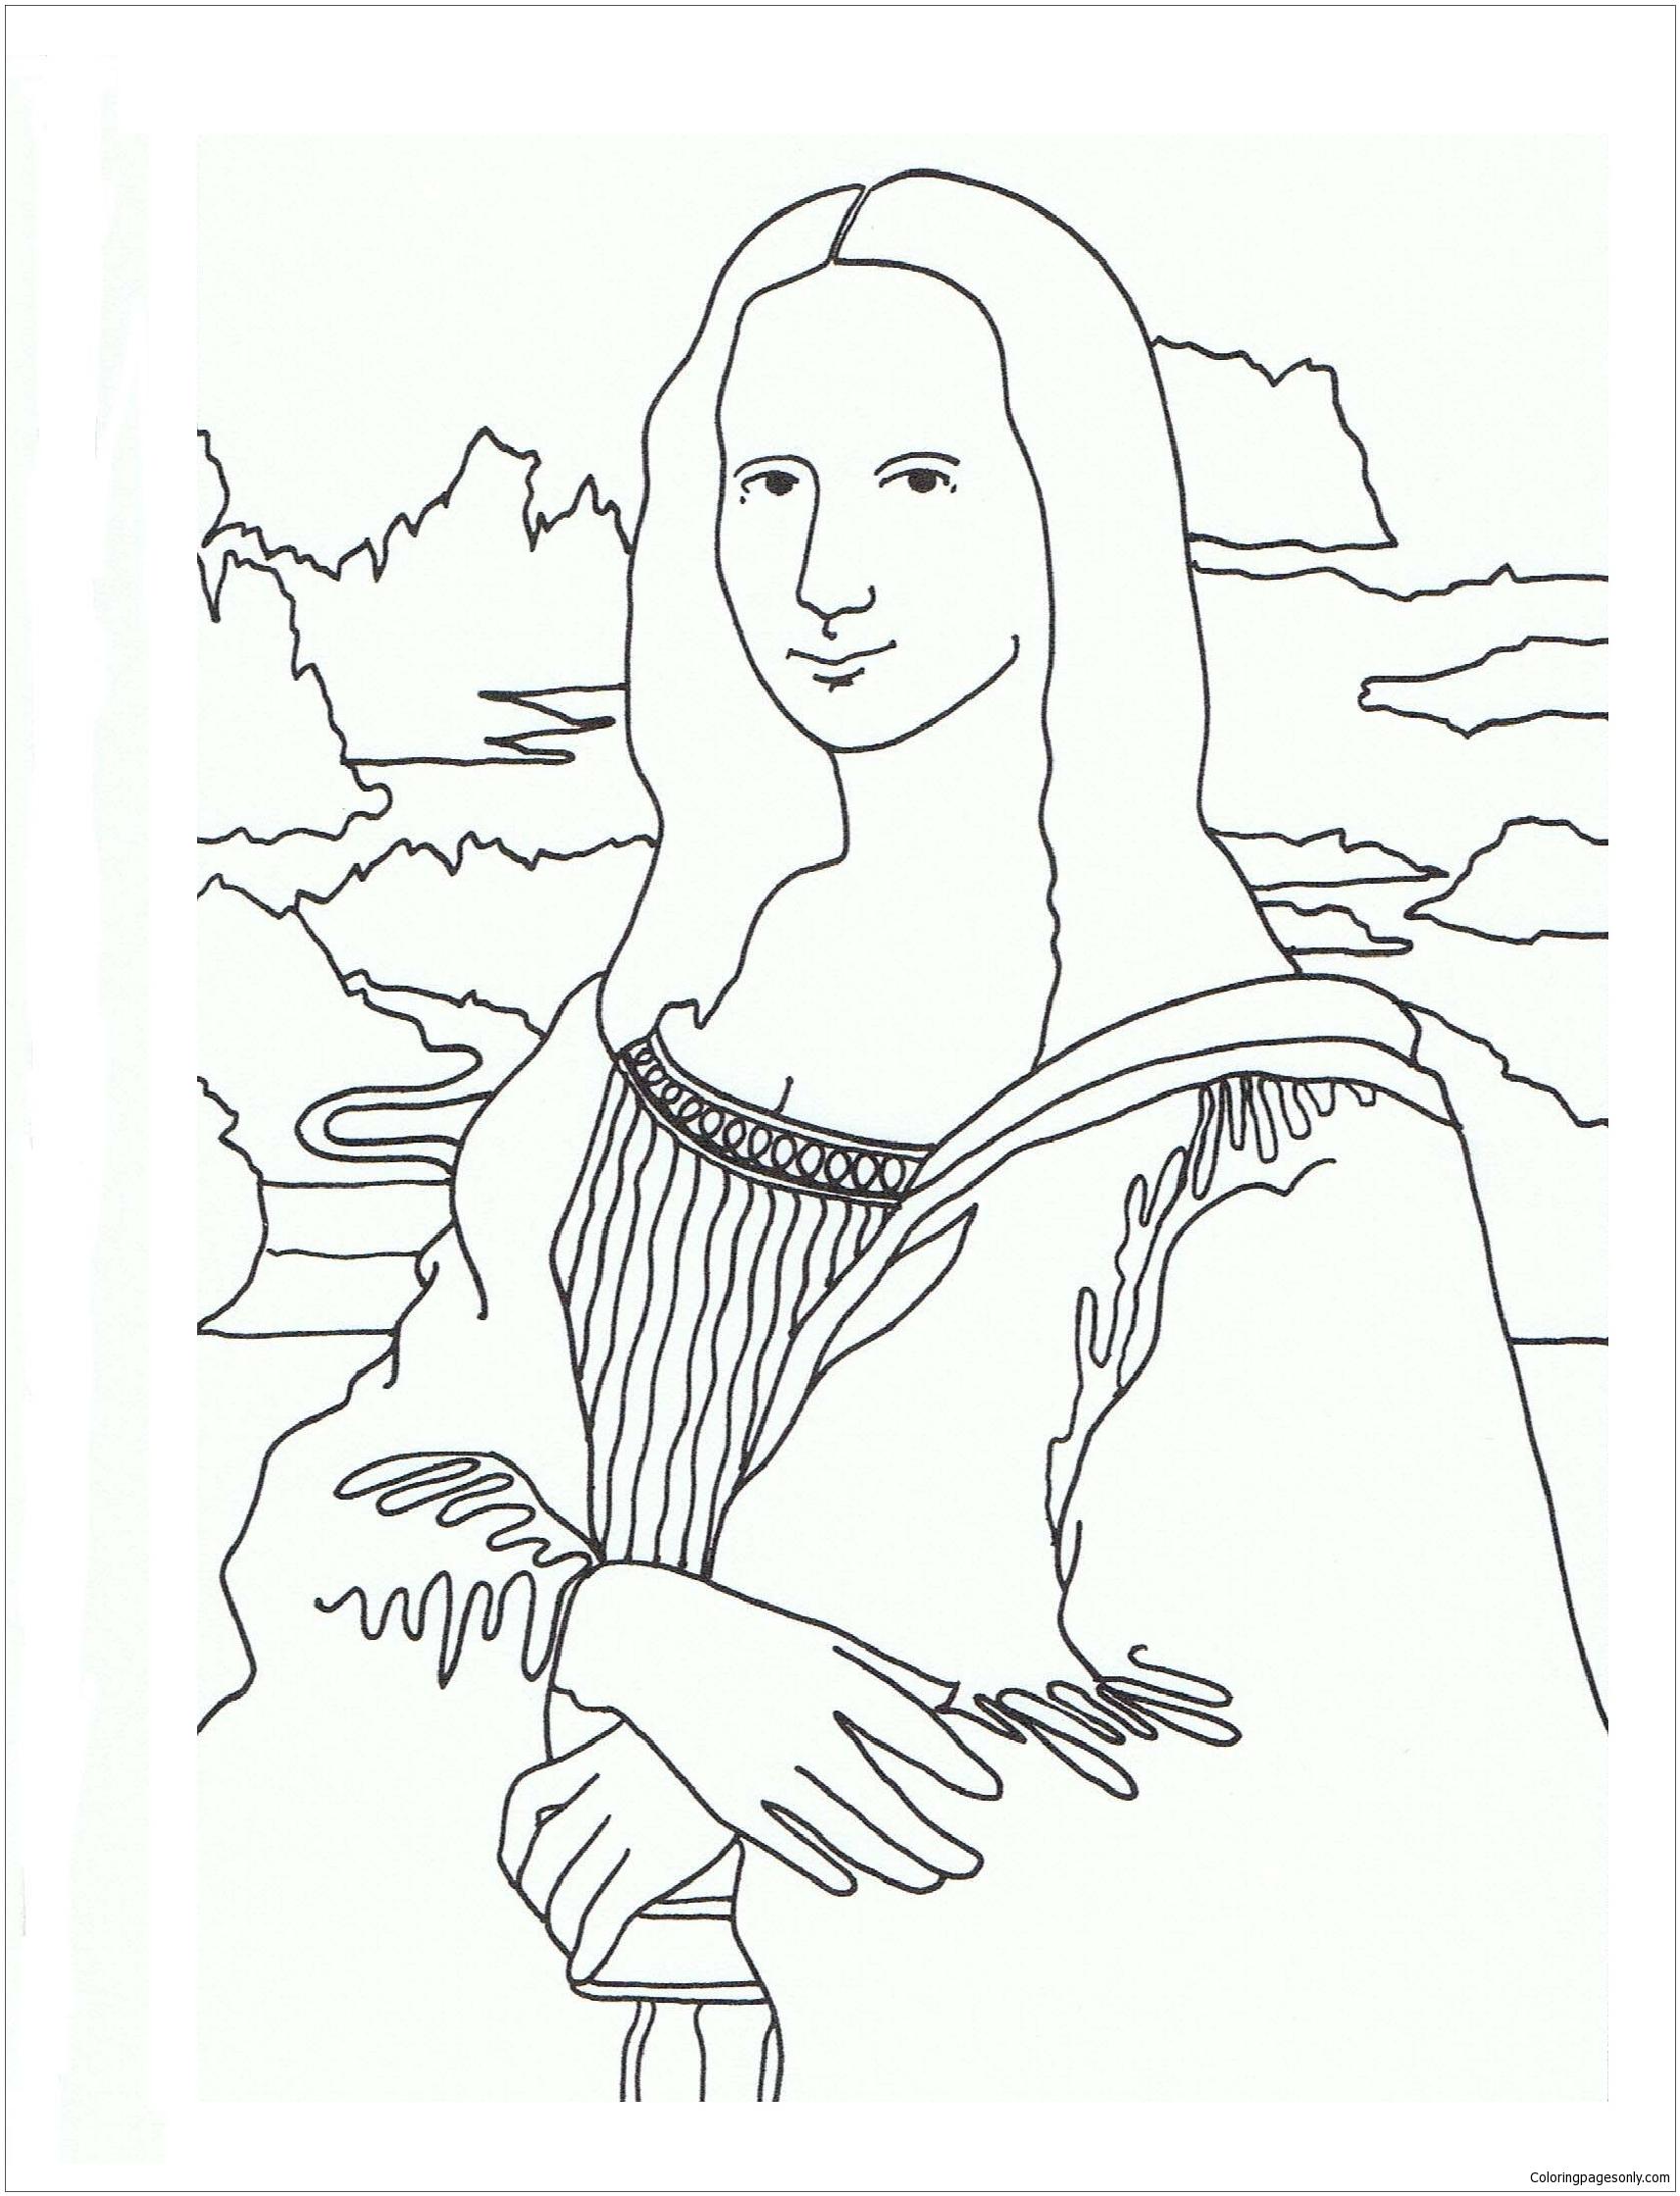 the mona lisa coloring page - Mona Lisa Coloring Page